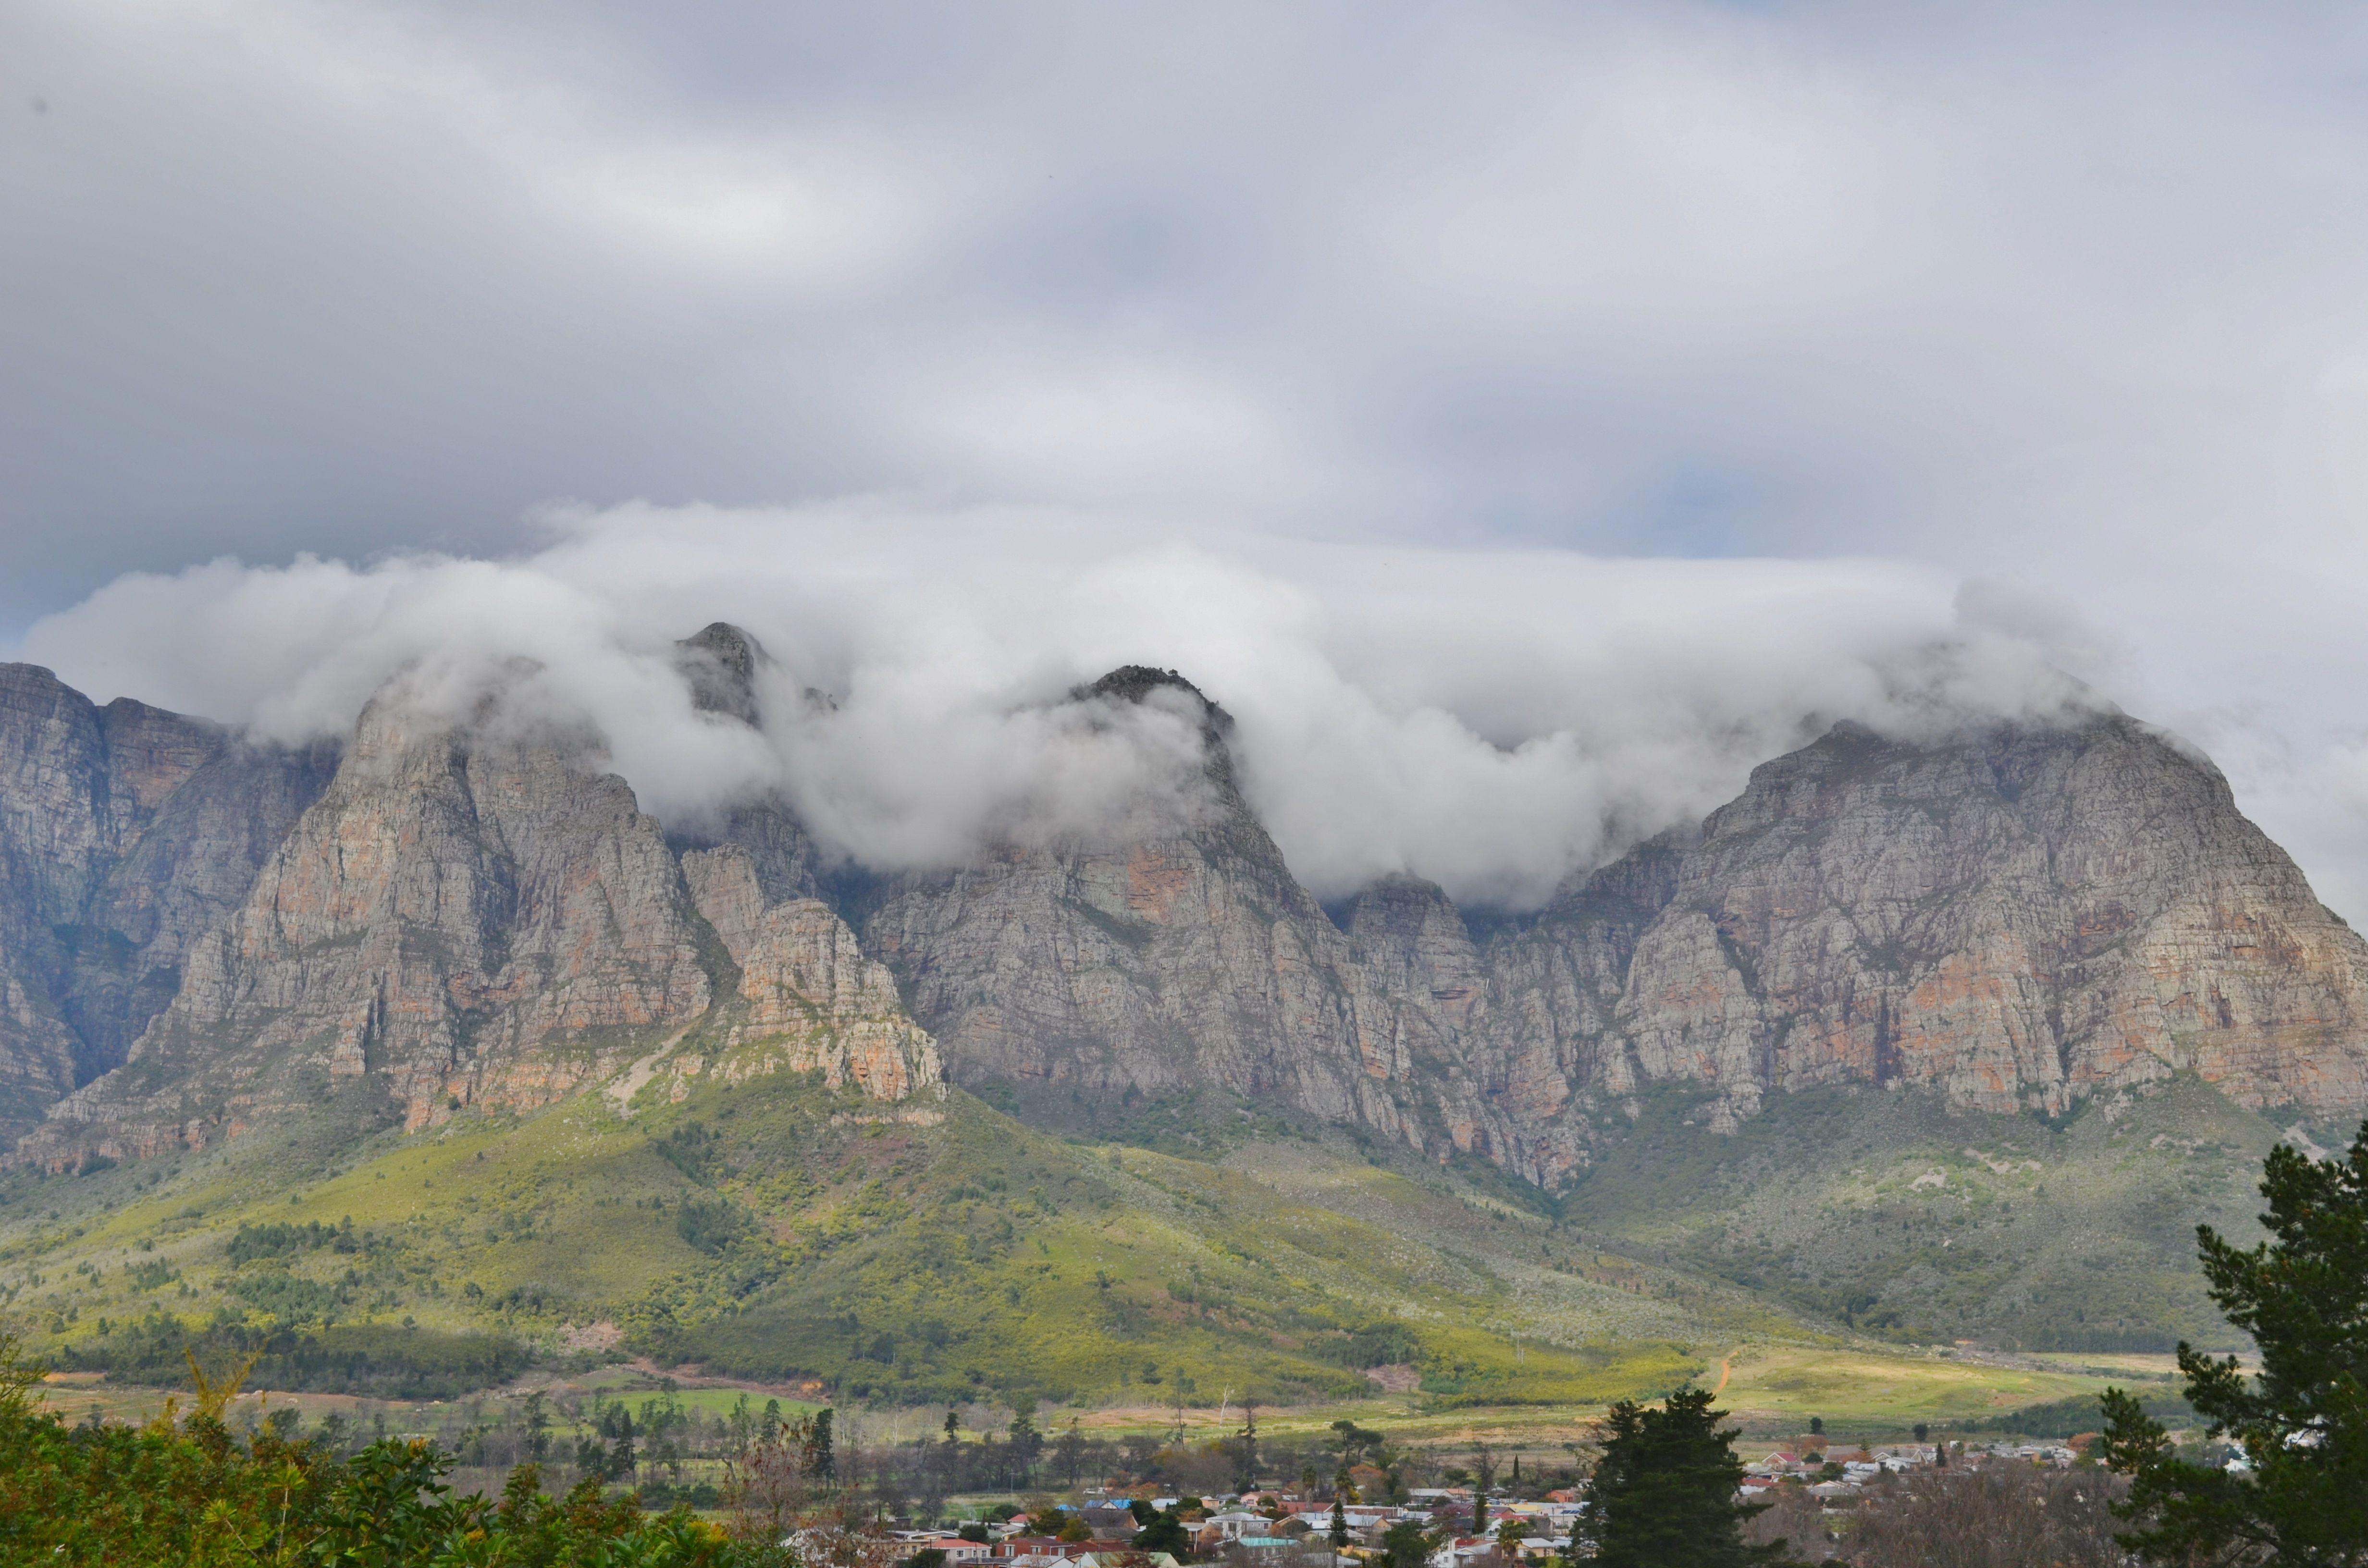 kylemore town below the mountain range of the banhoek conservancy